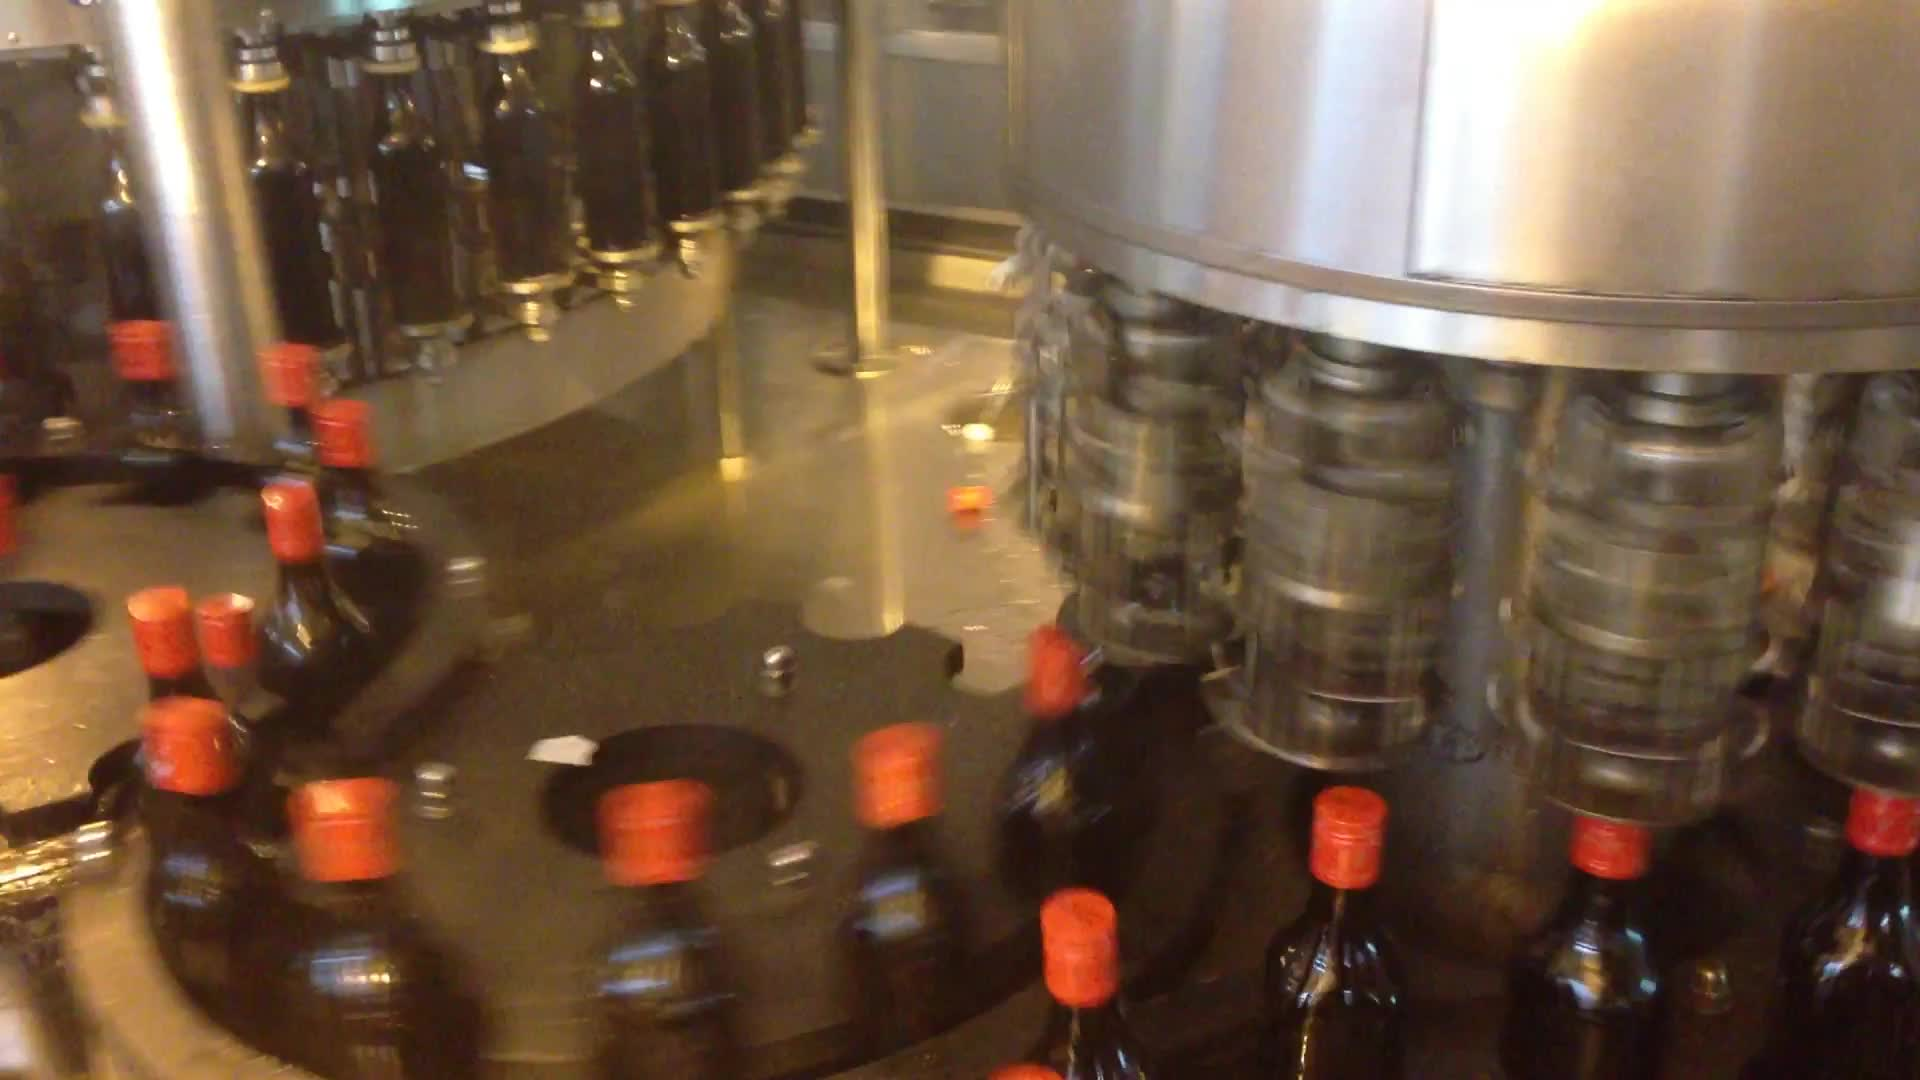 भावना कांच की बोतल के लिए शराब भरने की मशीन कार्बोनेटेड पेय बॉटलिंग मशीन लाइन के साथ वोदका व्हिस्की जिन सील